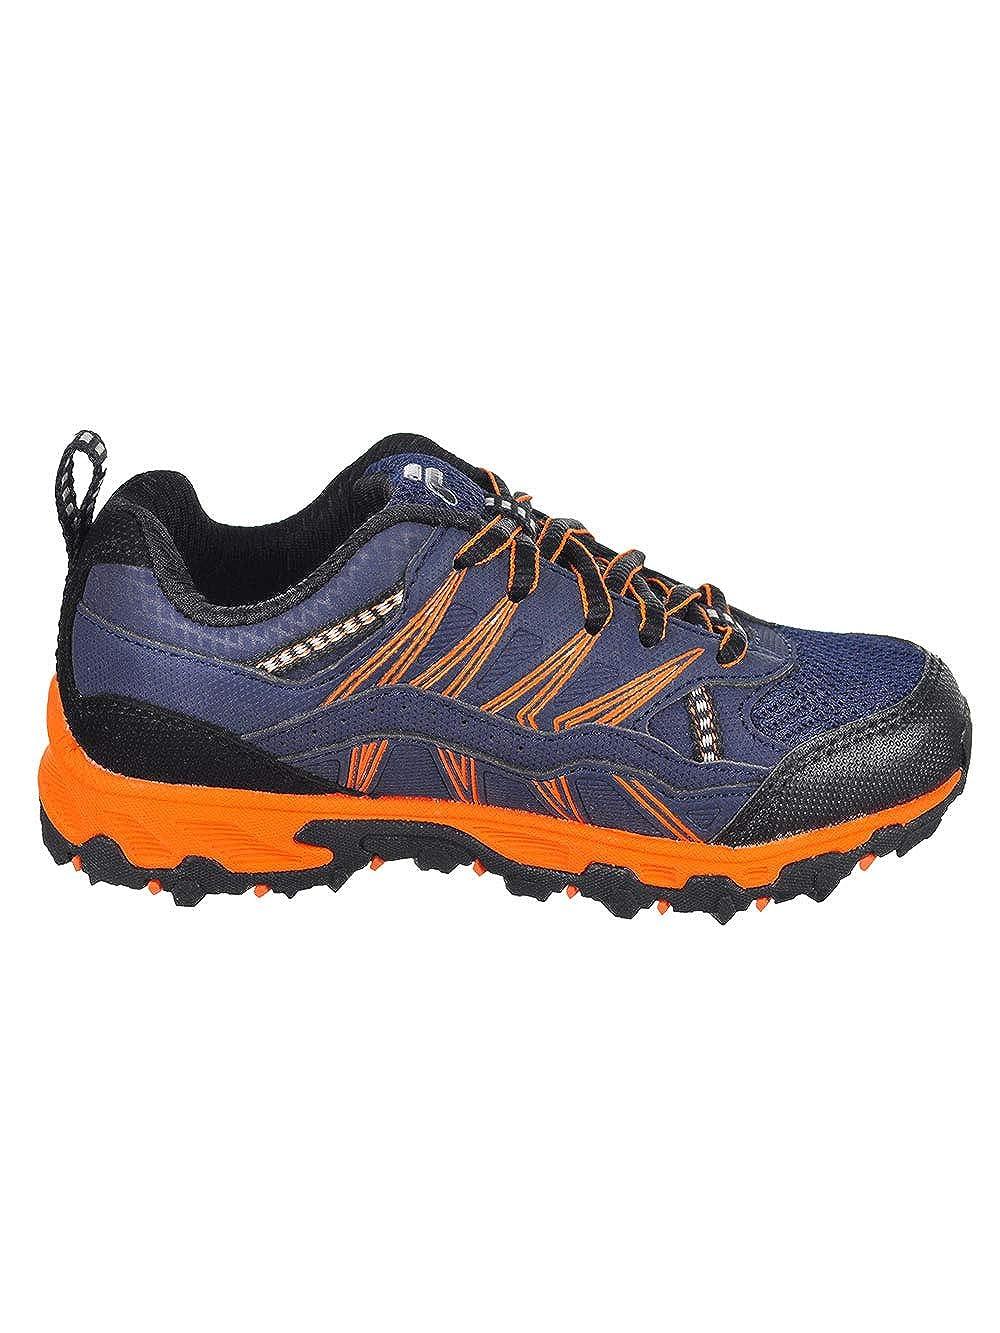 Boy's Fila, At Peake 16 Trail Running Sneaker Boy's Fila